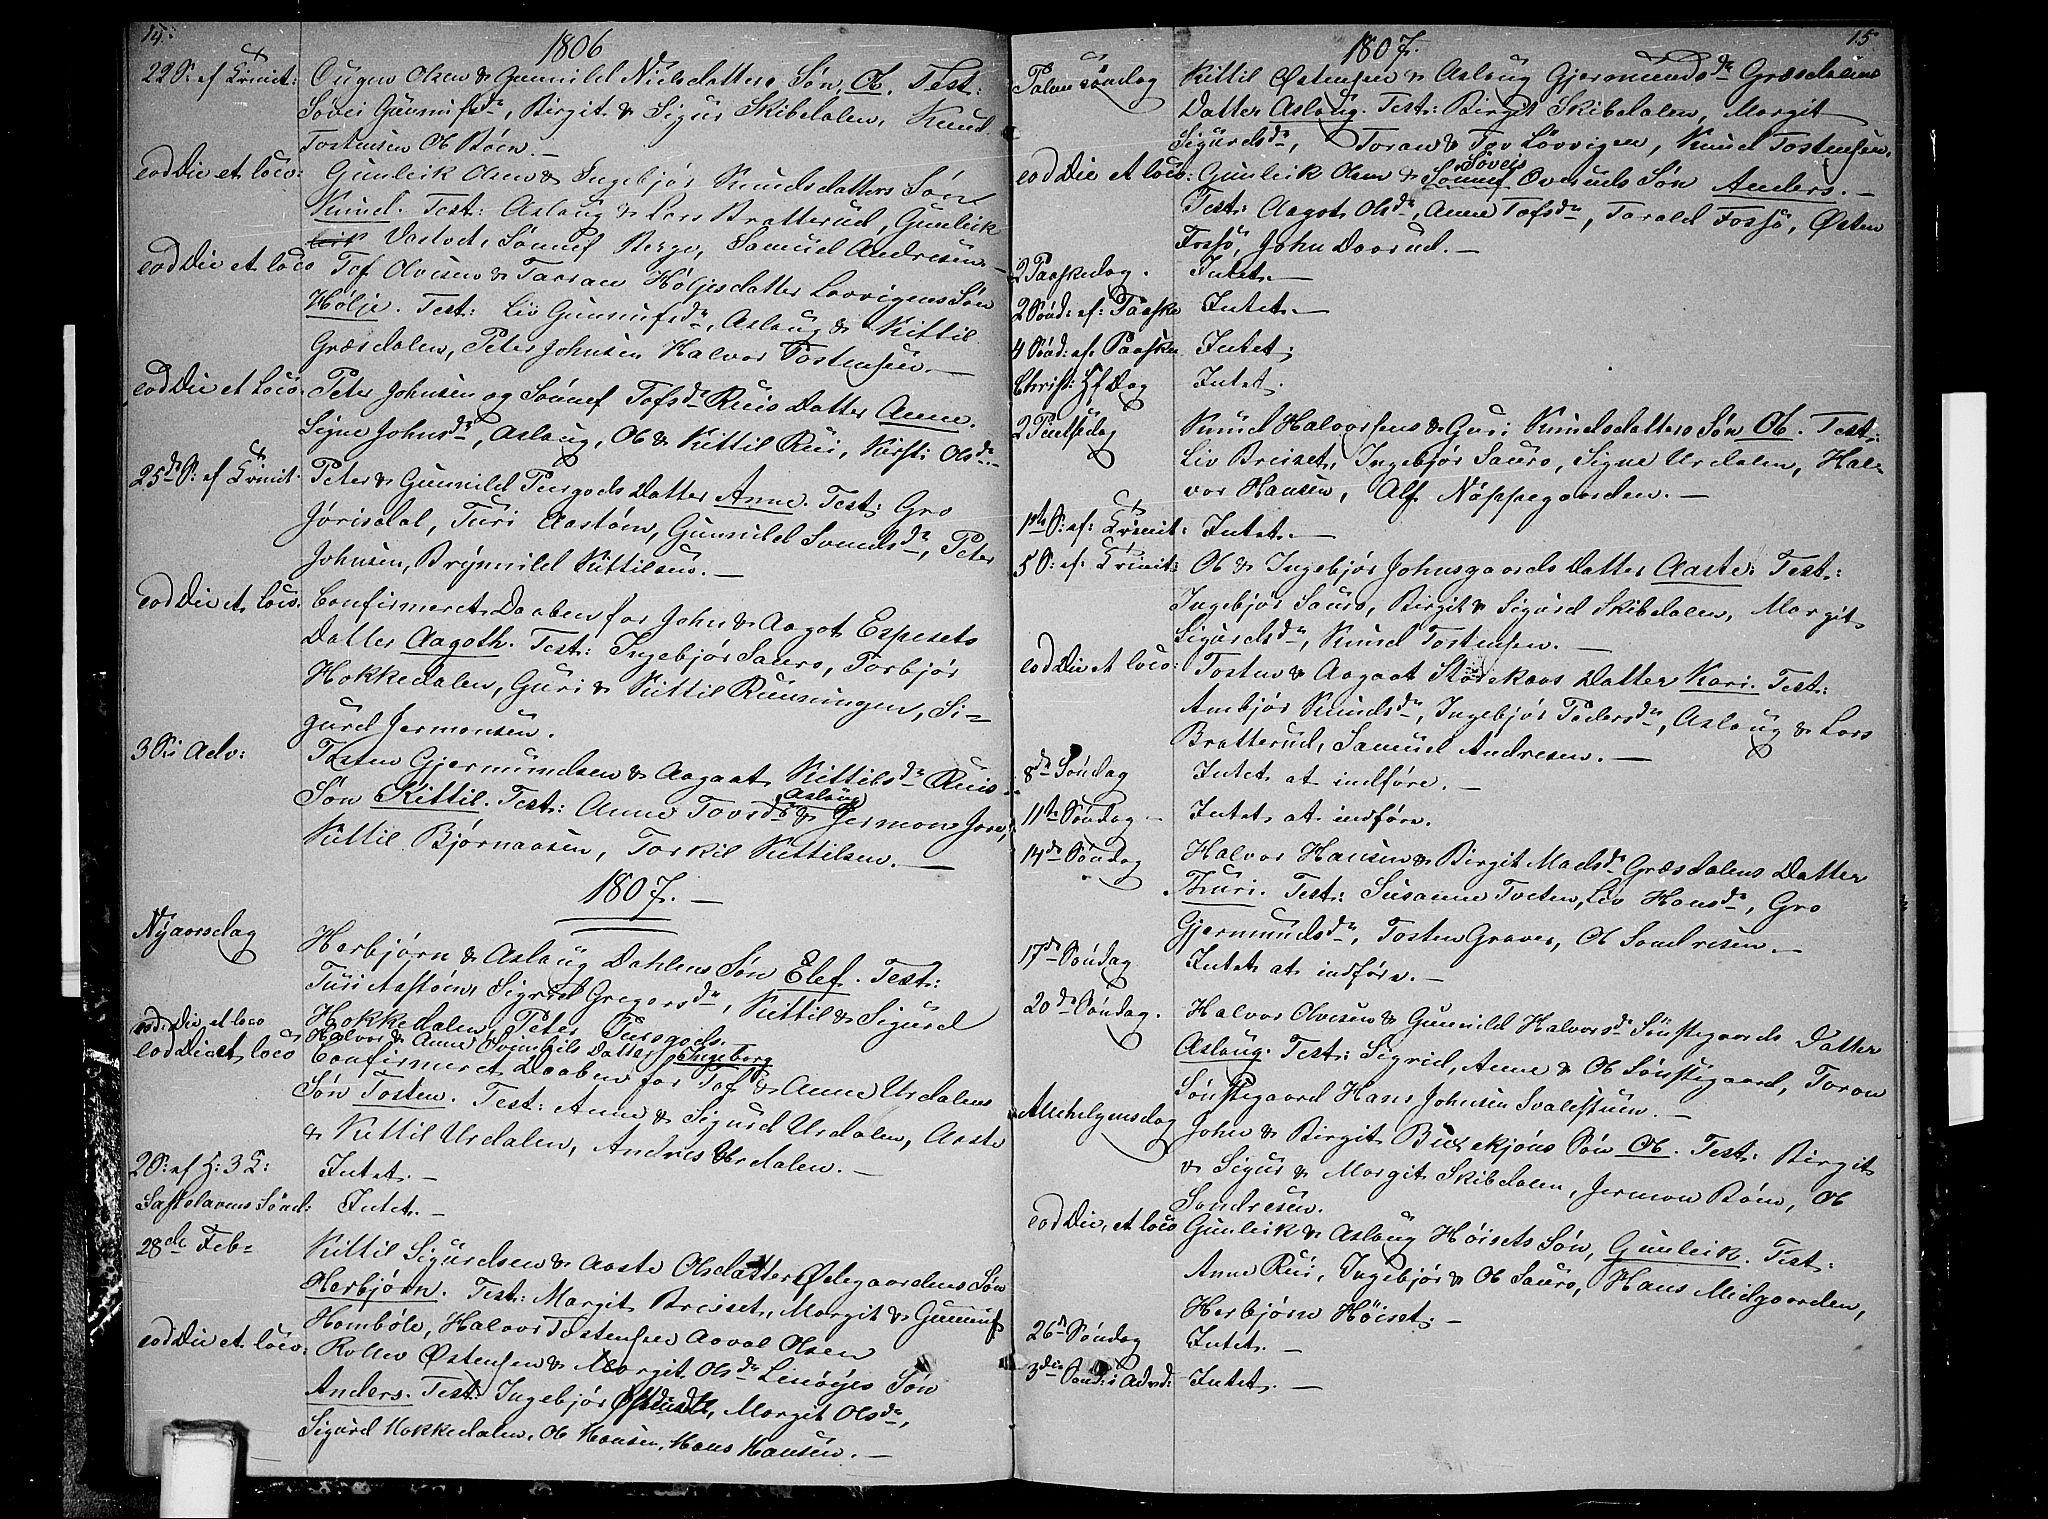 SAKO, Gransherad kirkebøker, F/Fb/L0001: Ministerialbok nr. II 1, 1800-1814, s. 14-15